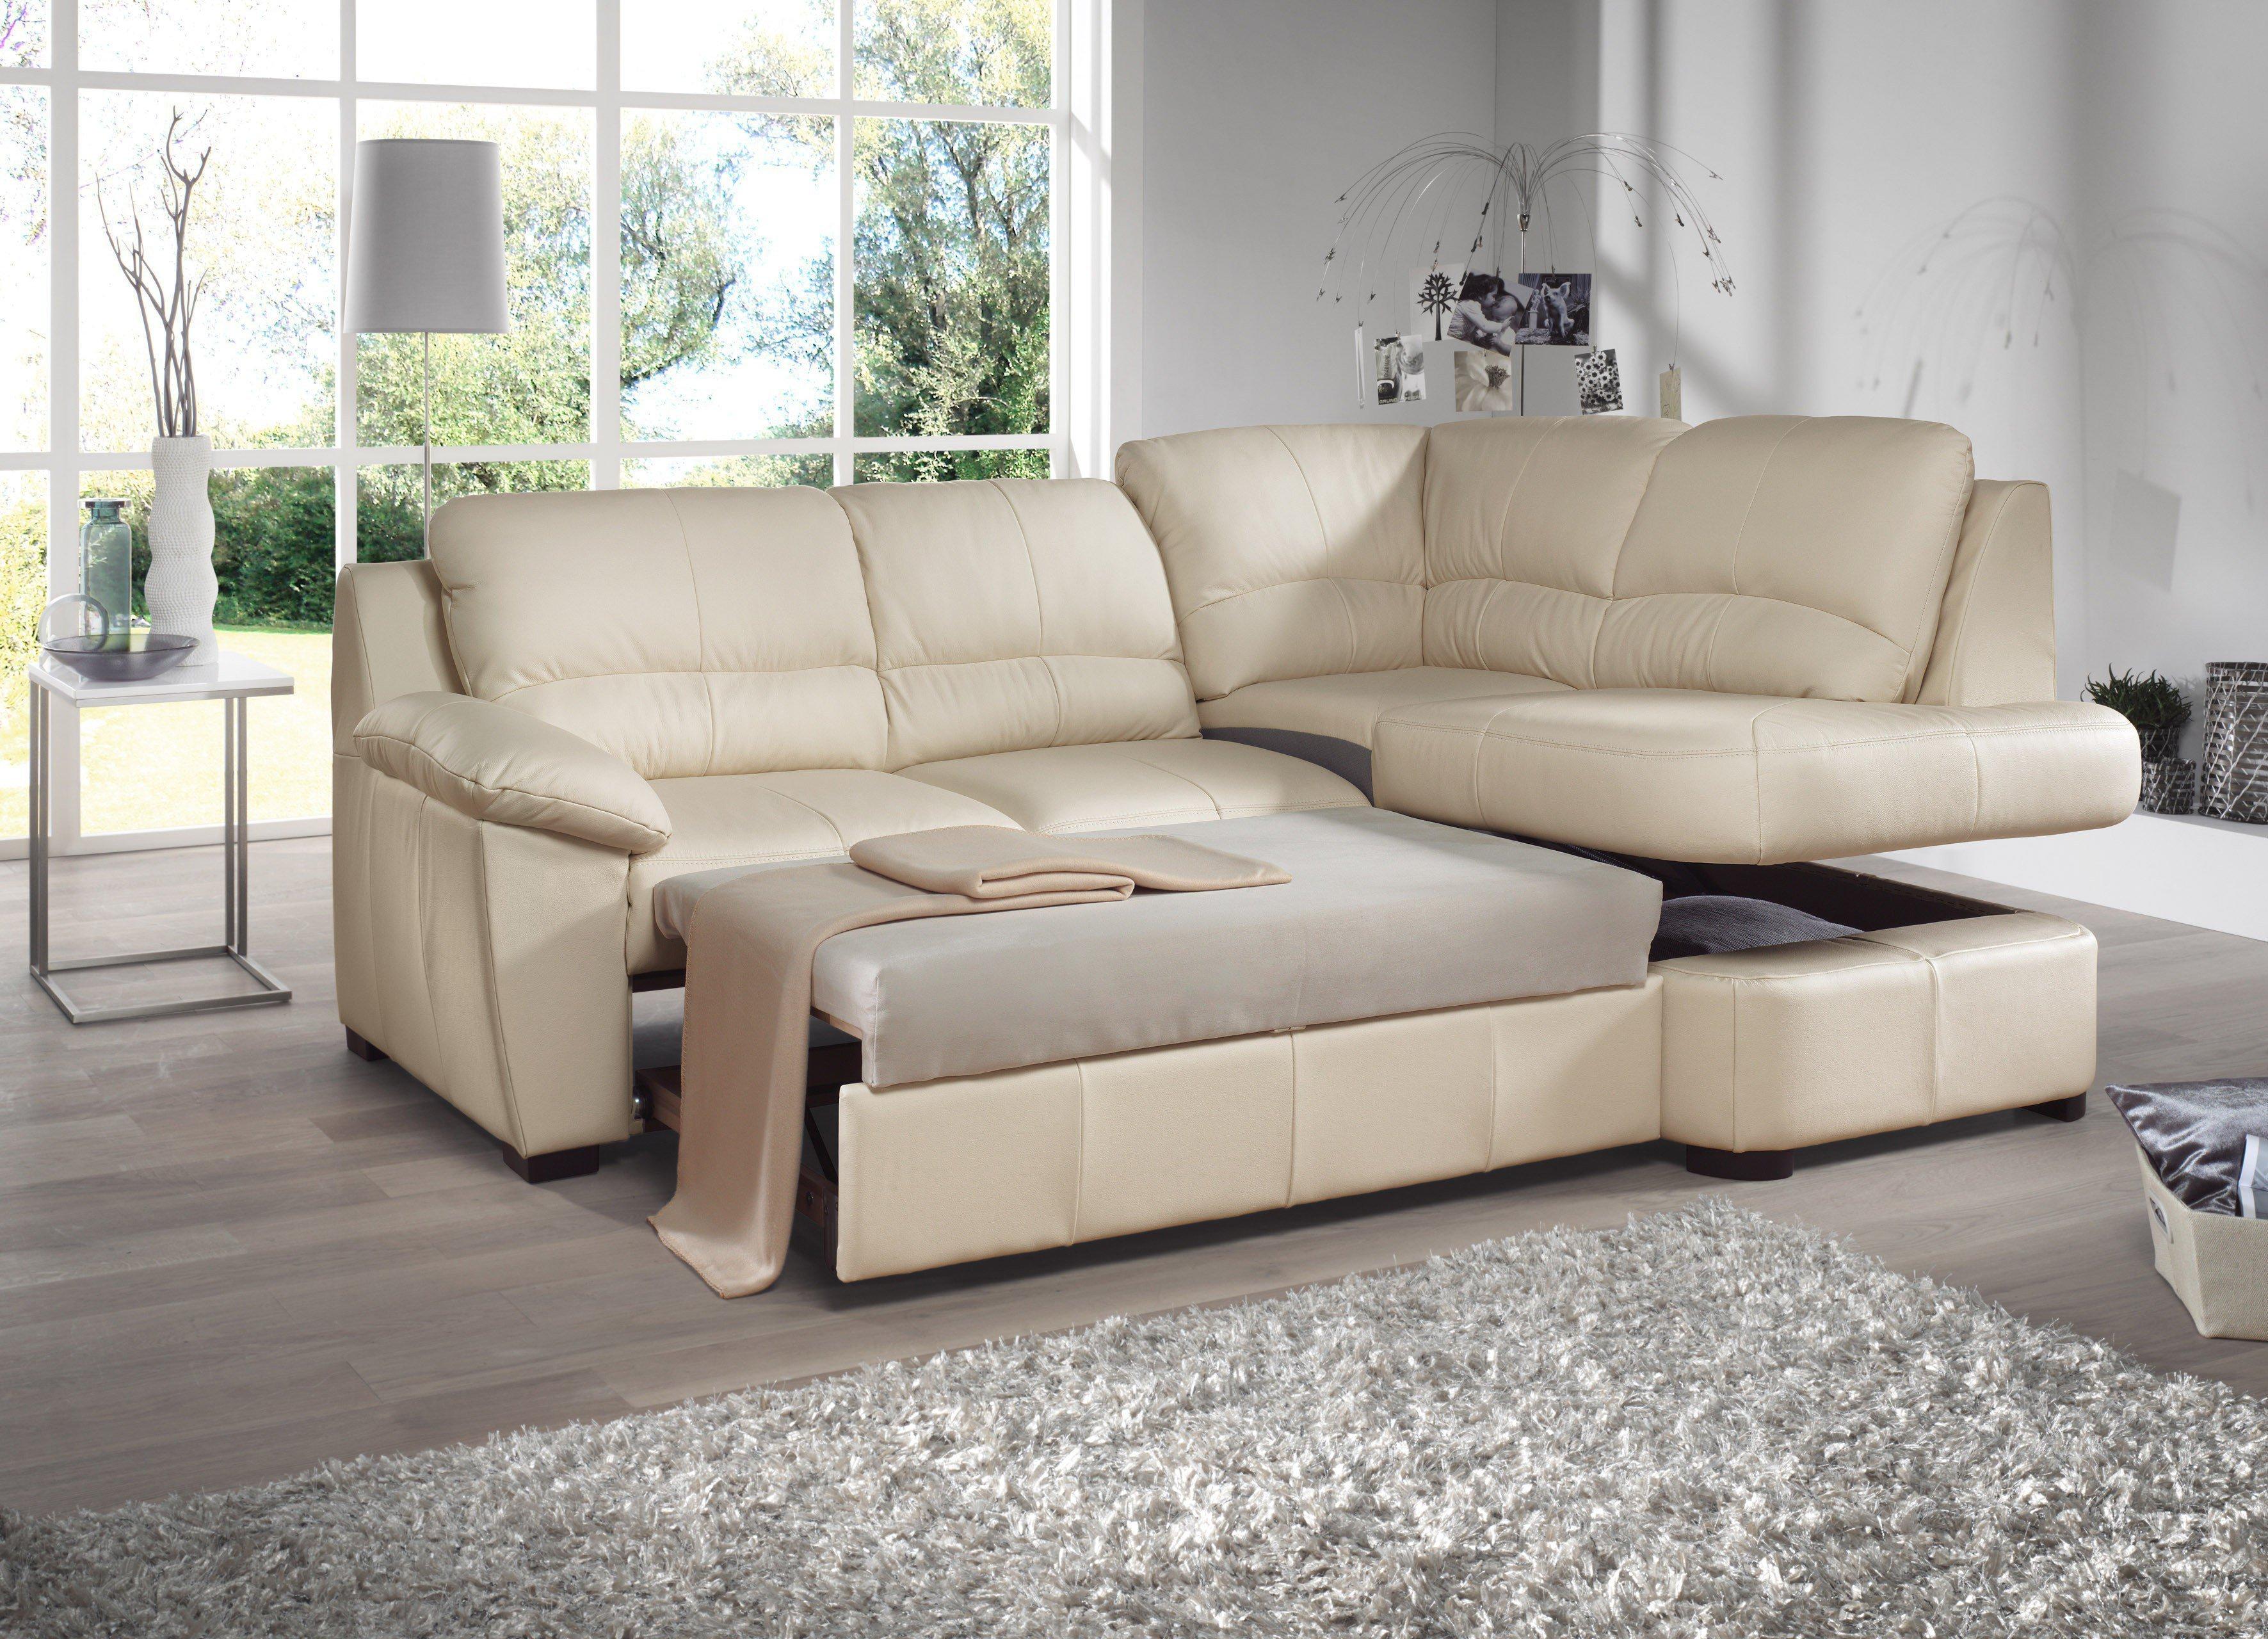 cotta danilo sofagarnitur in creme m bel letz ihr online shop. Black Bedroom Furniture Sets. Home Design Ideas